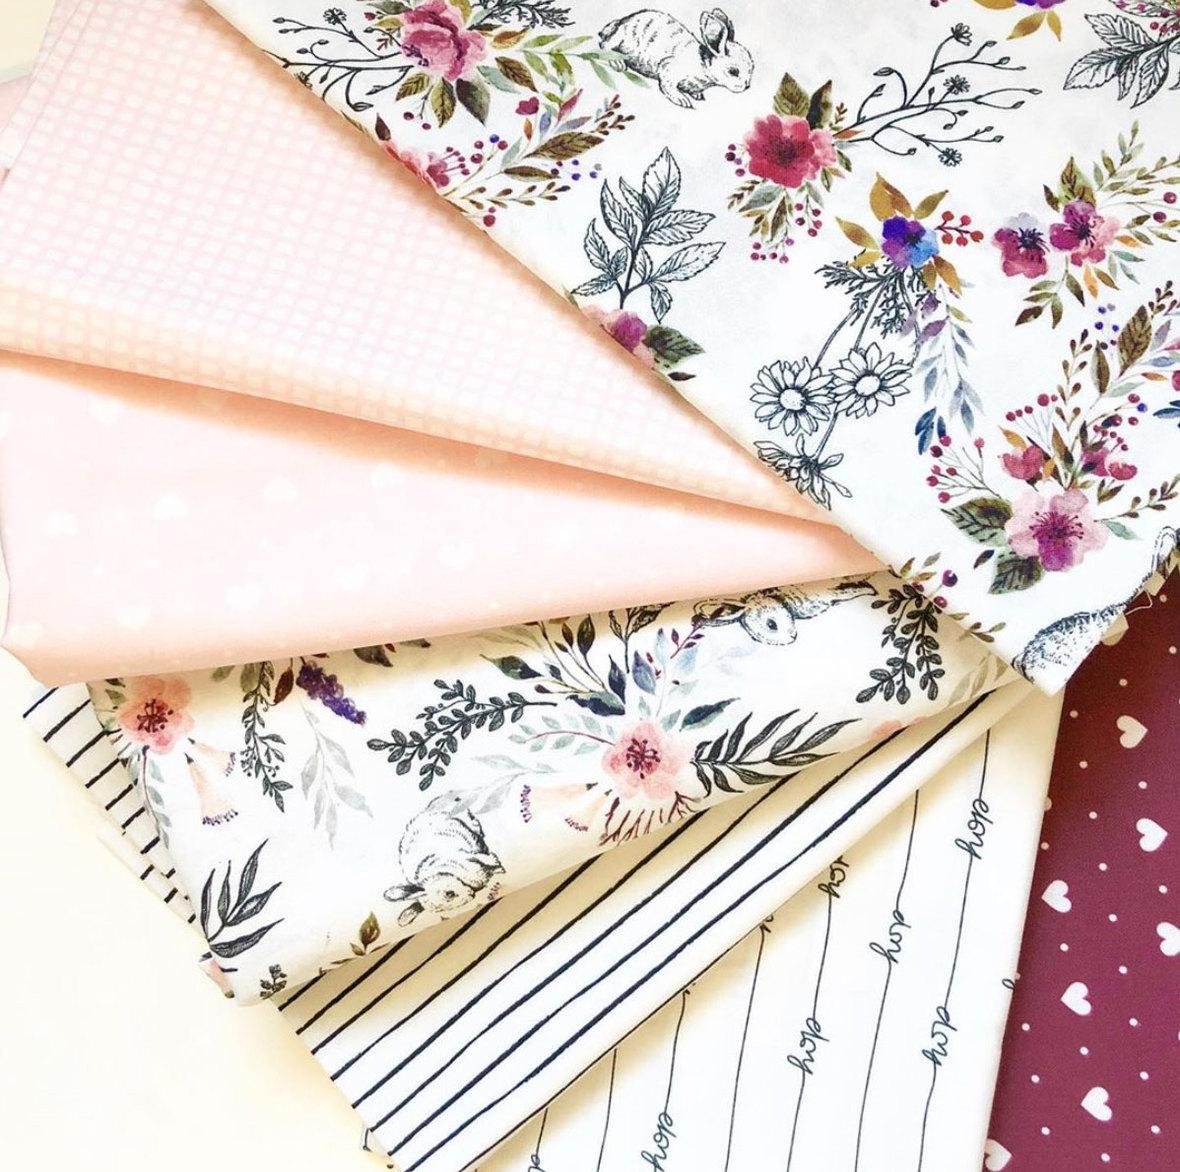 Erin-Kendal-Enchanted-Garden-Fabric-for-Hawthorne-Supply-Co